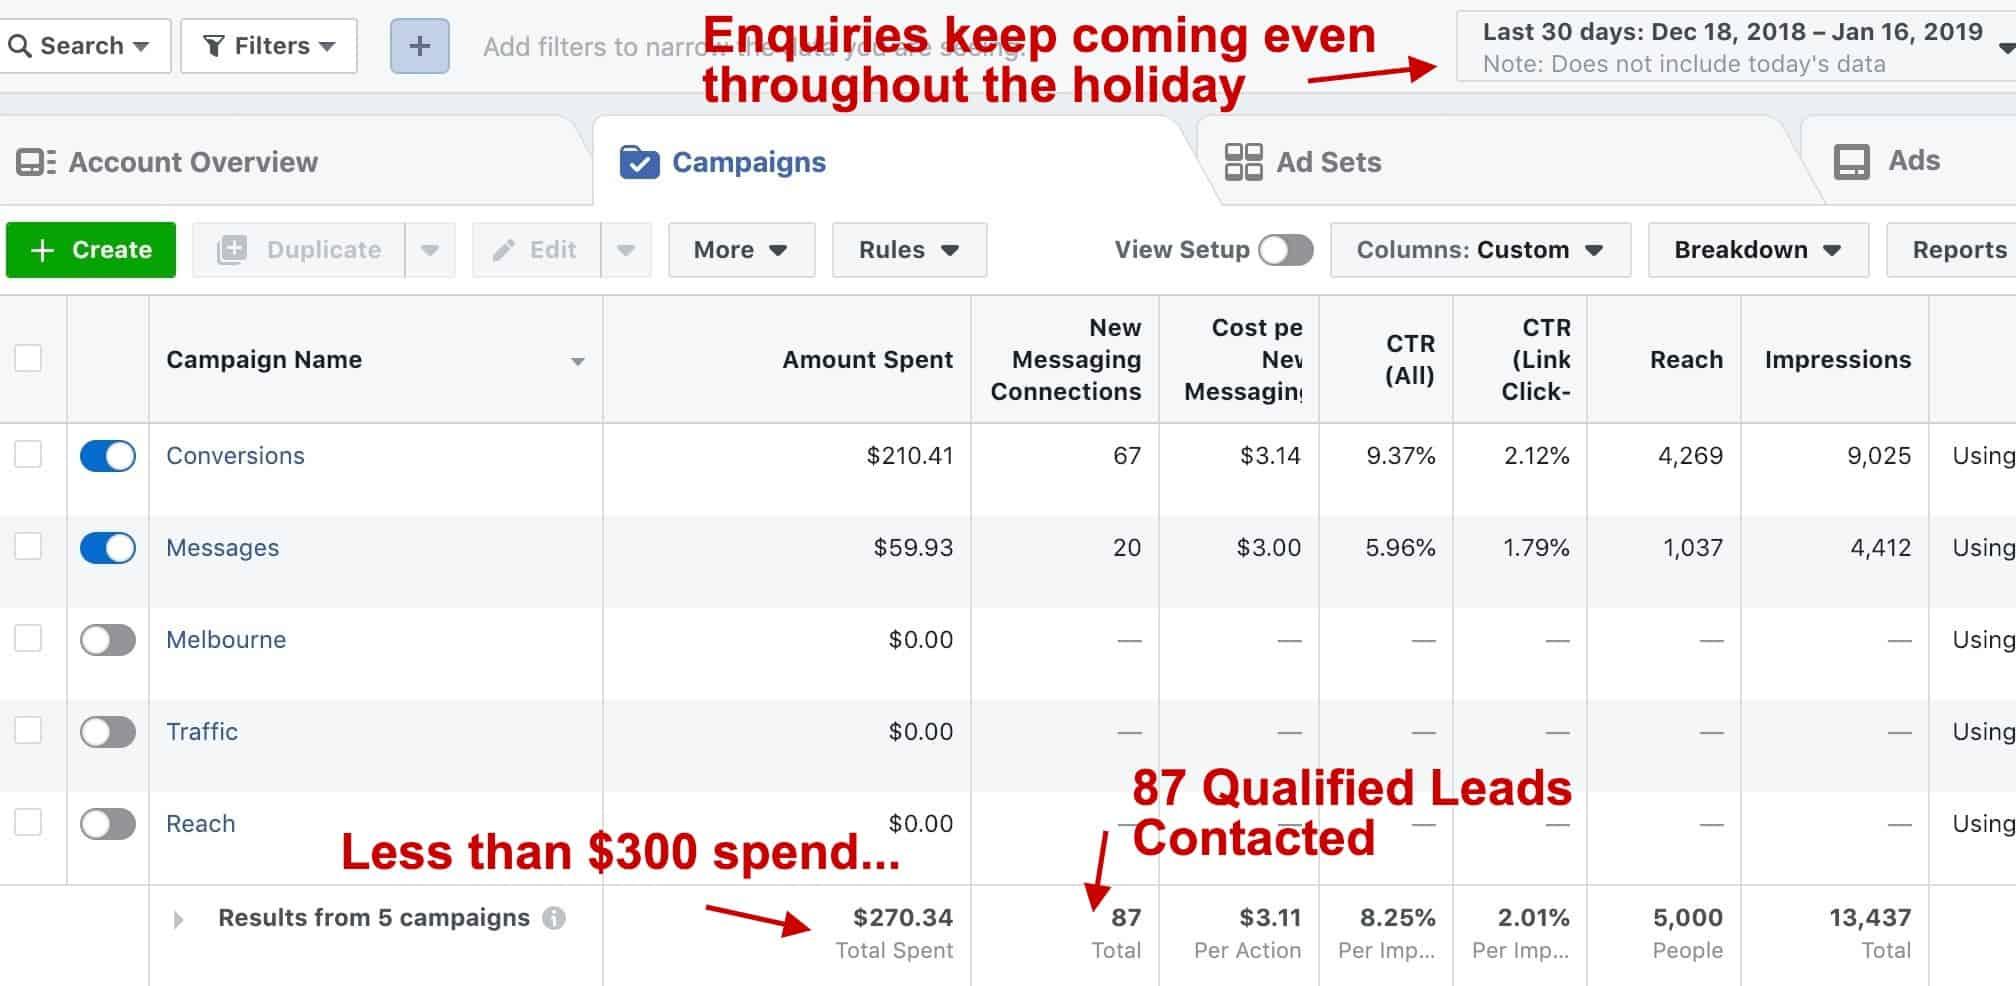 screenshot-business.facebook.com-2019.01.17-18-19-09